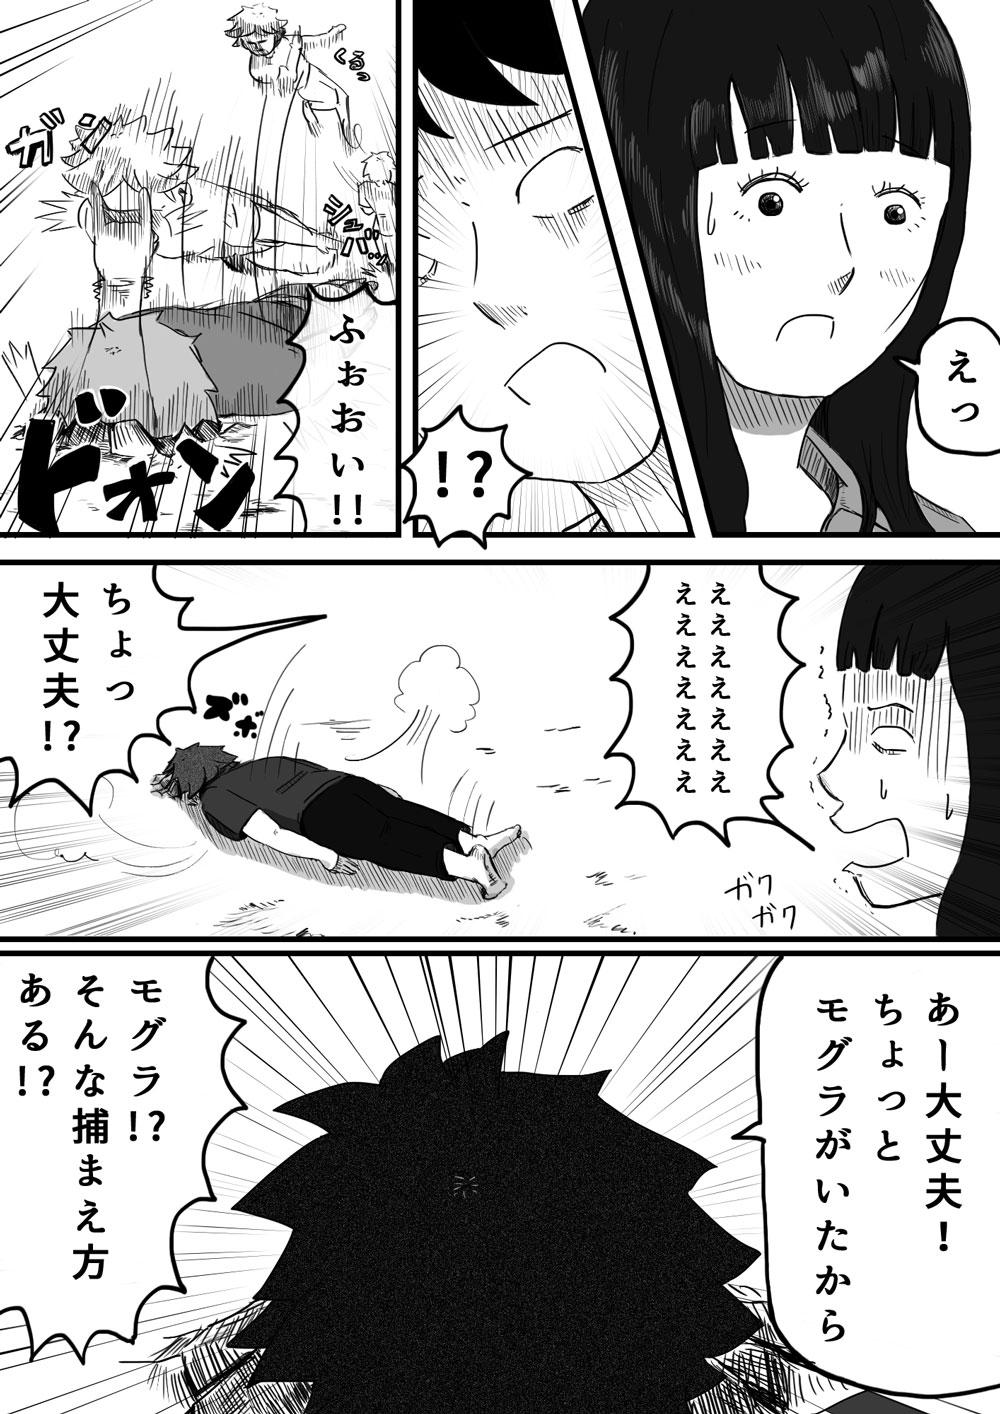 arnolds-hasegawa-005-4